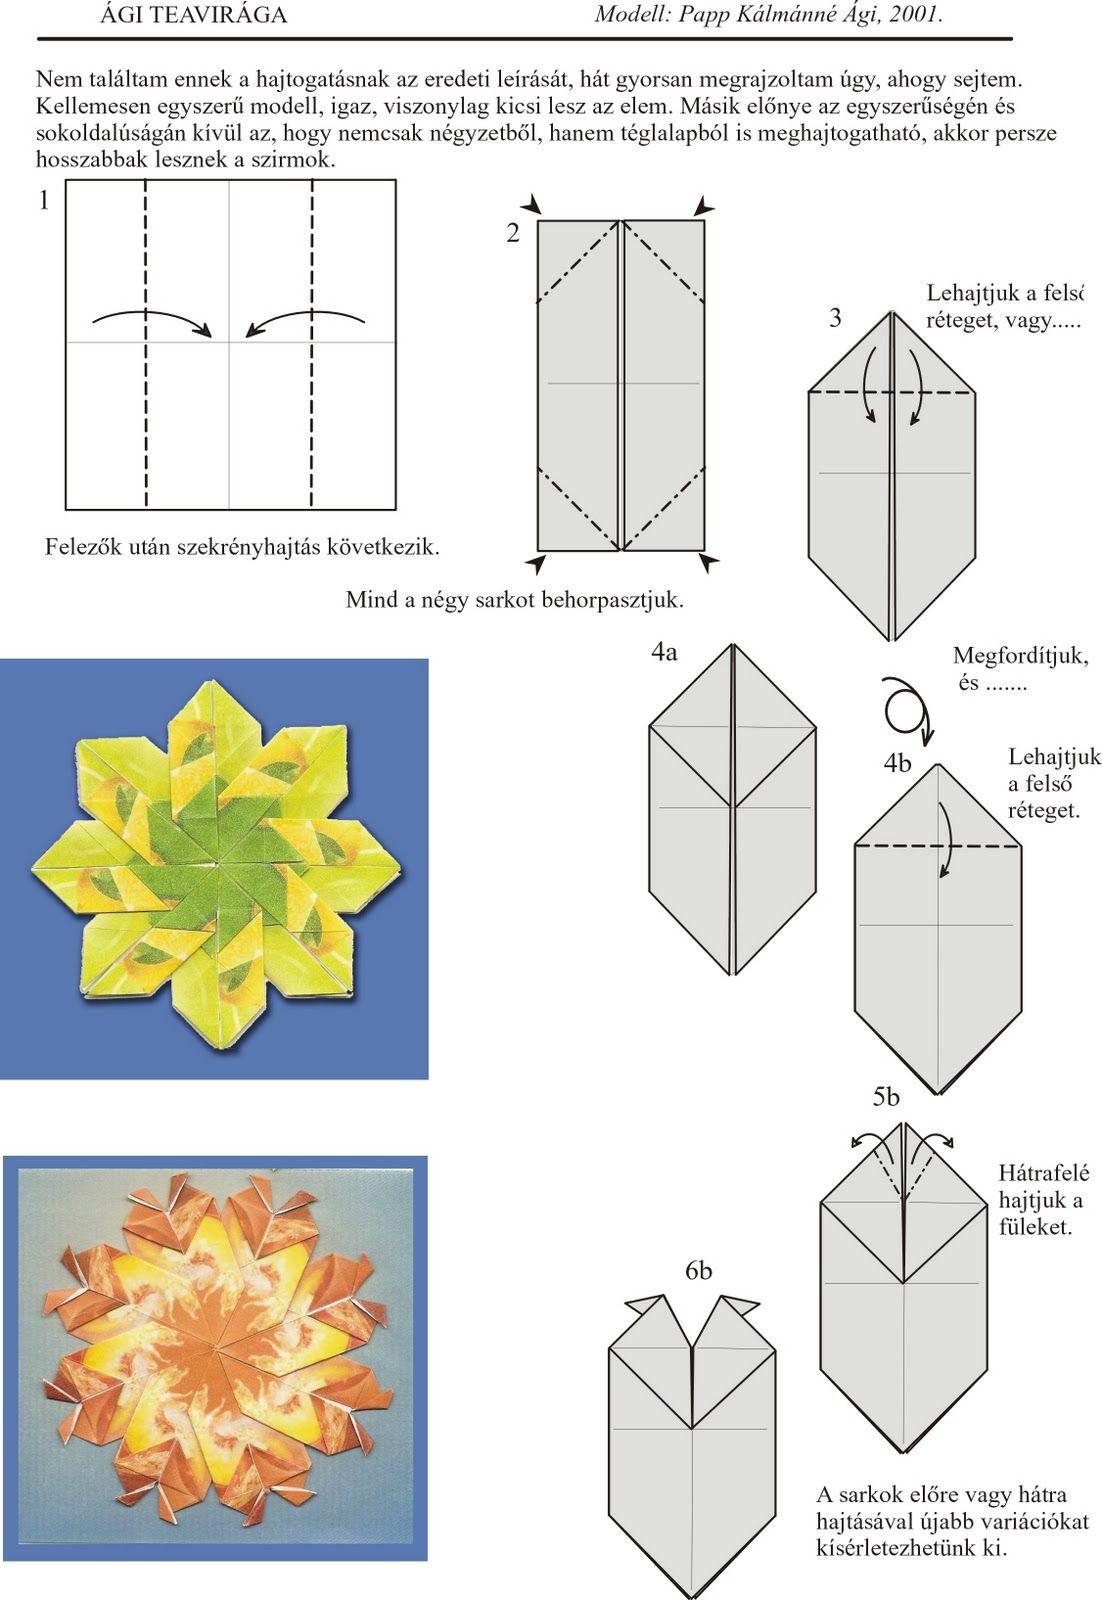 Pin By Horvth Amarilllisz On Papr Hajtogatsvgs Pinterest Origami Flowers Diagrams Teas And Bag